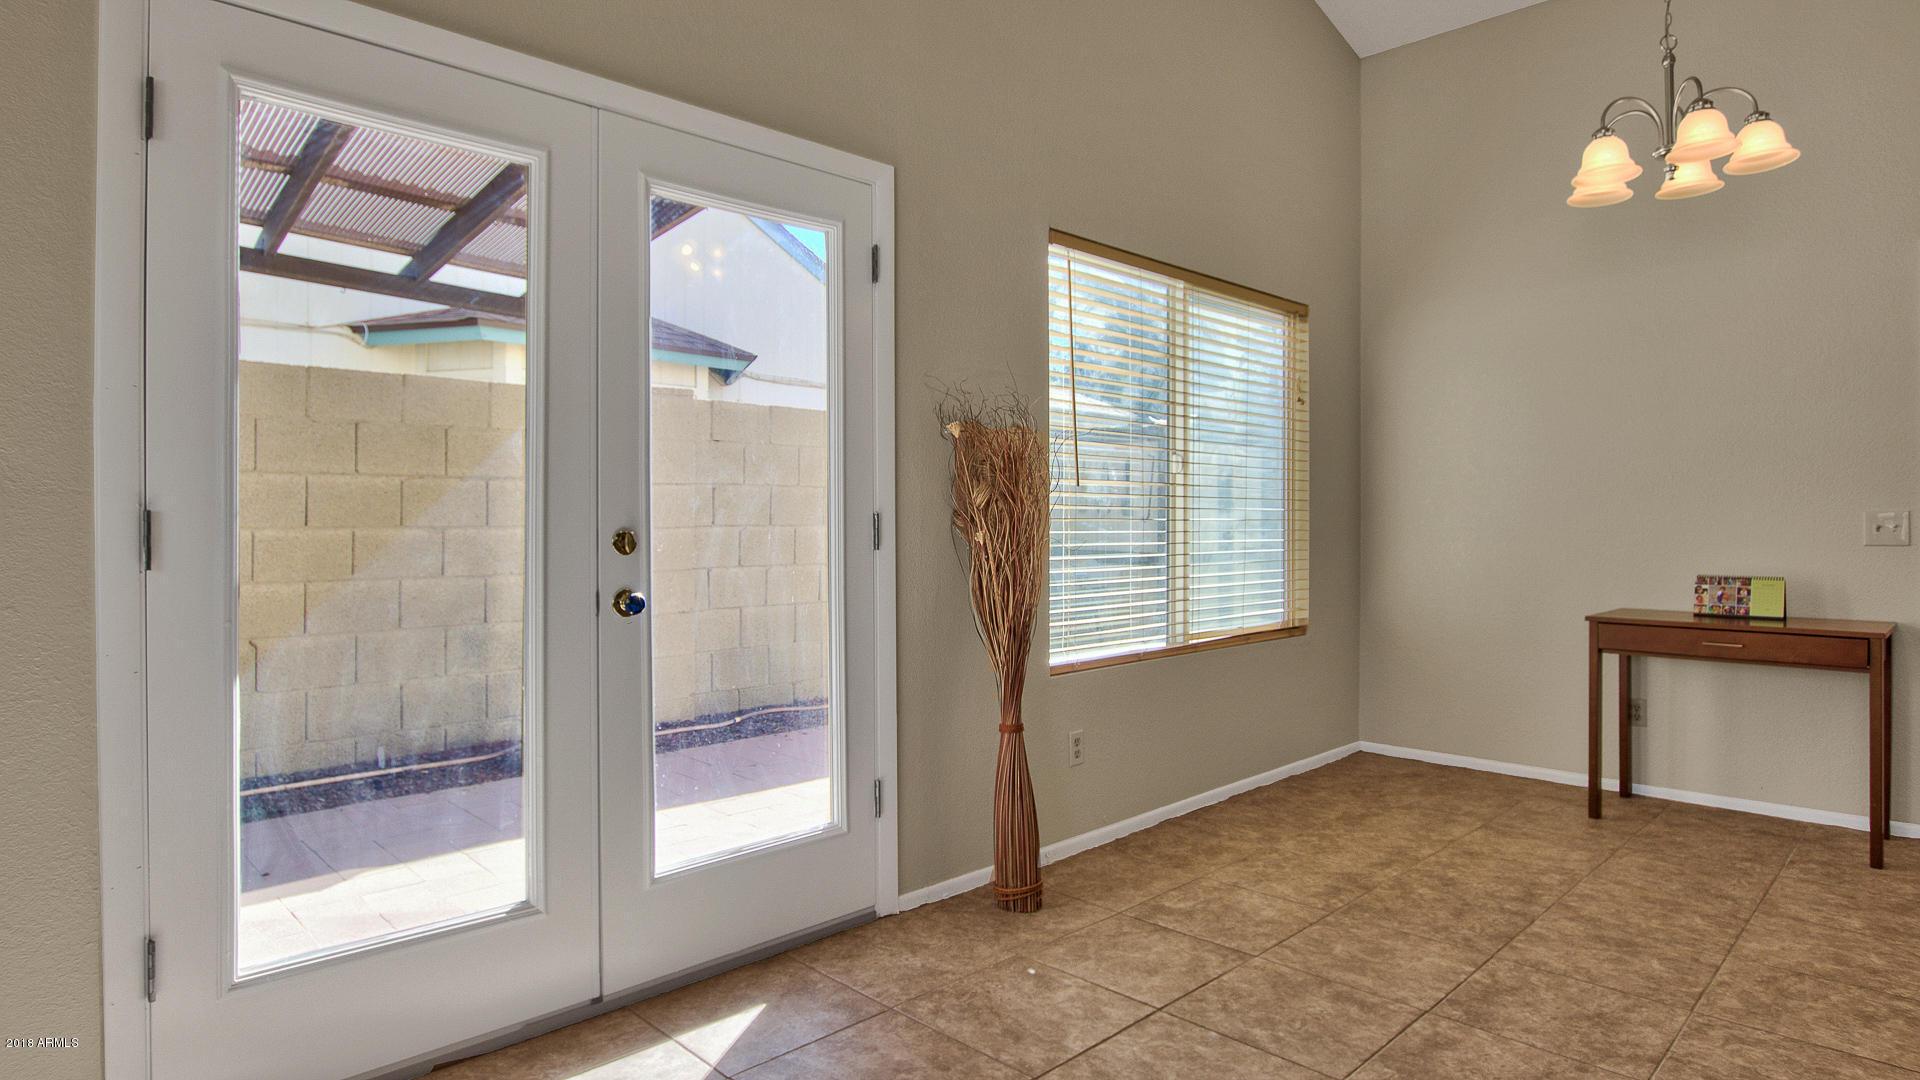 3676 W CINDY Street Chandler, AZ 85226 - MLS #: 5851448